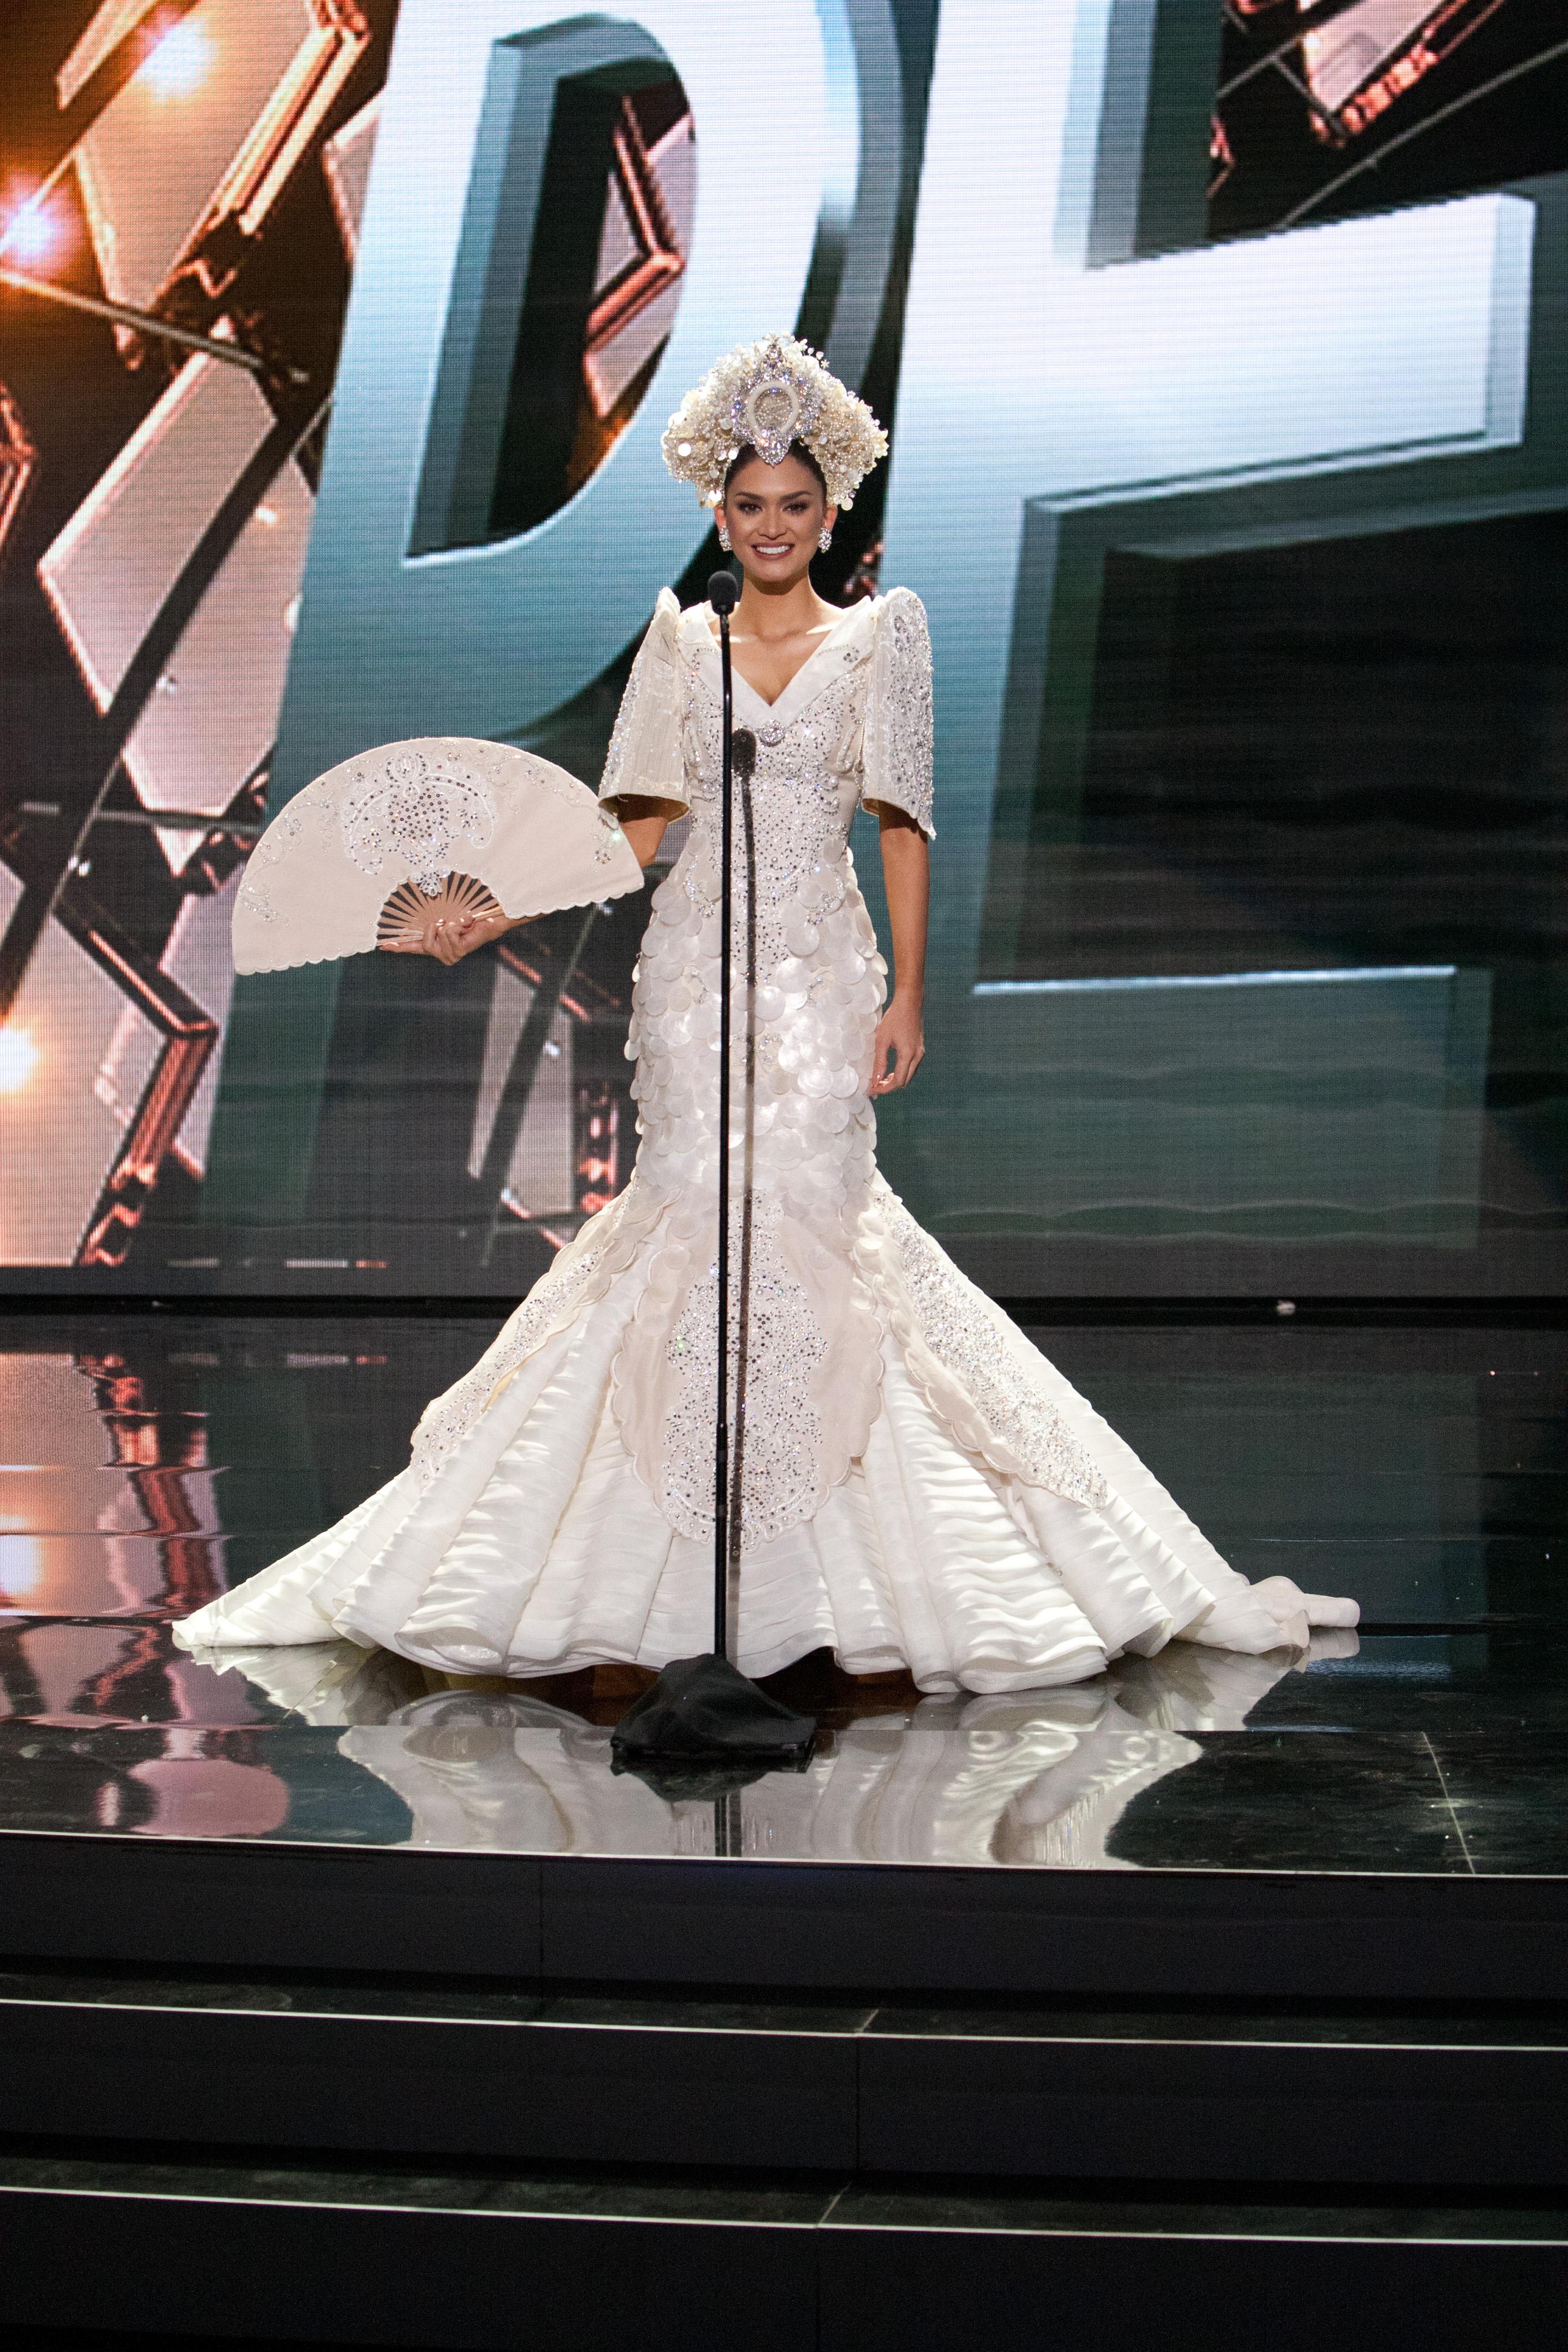 Look Miss Universe Ph 2015 Pia Wurtzbach S National Costume